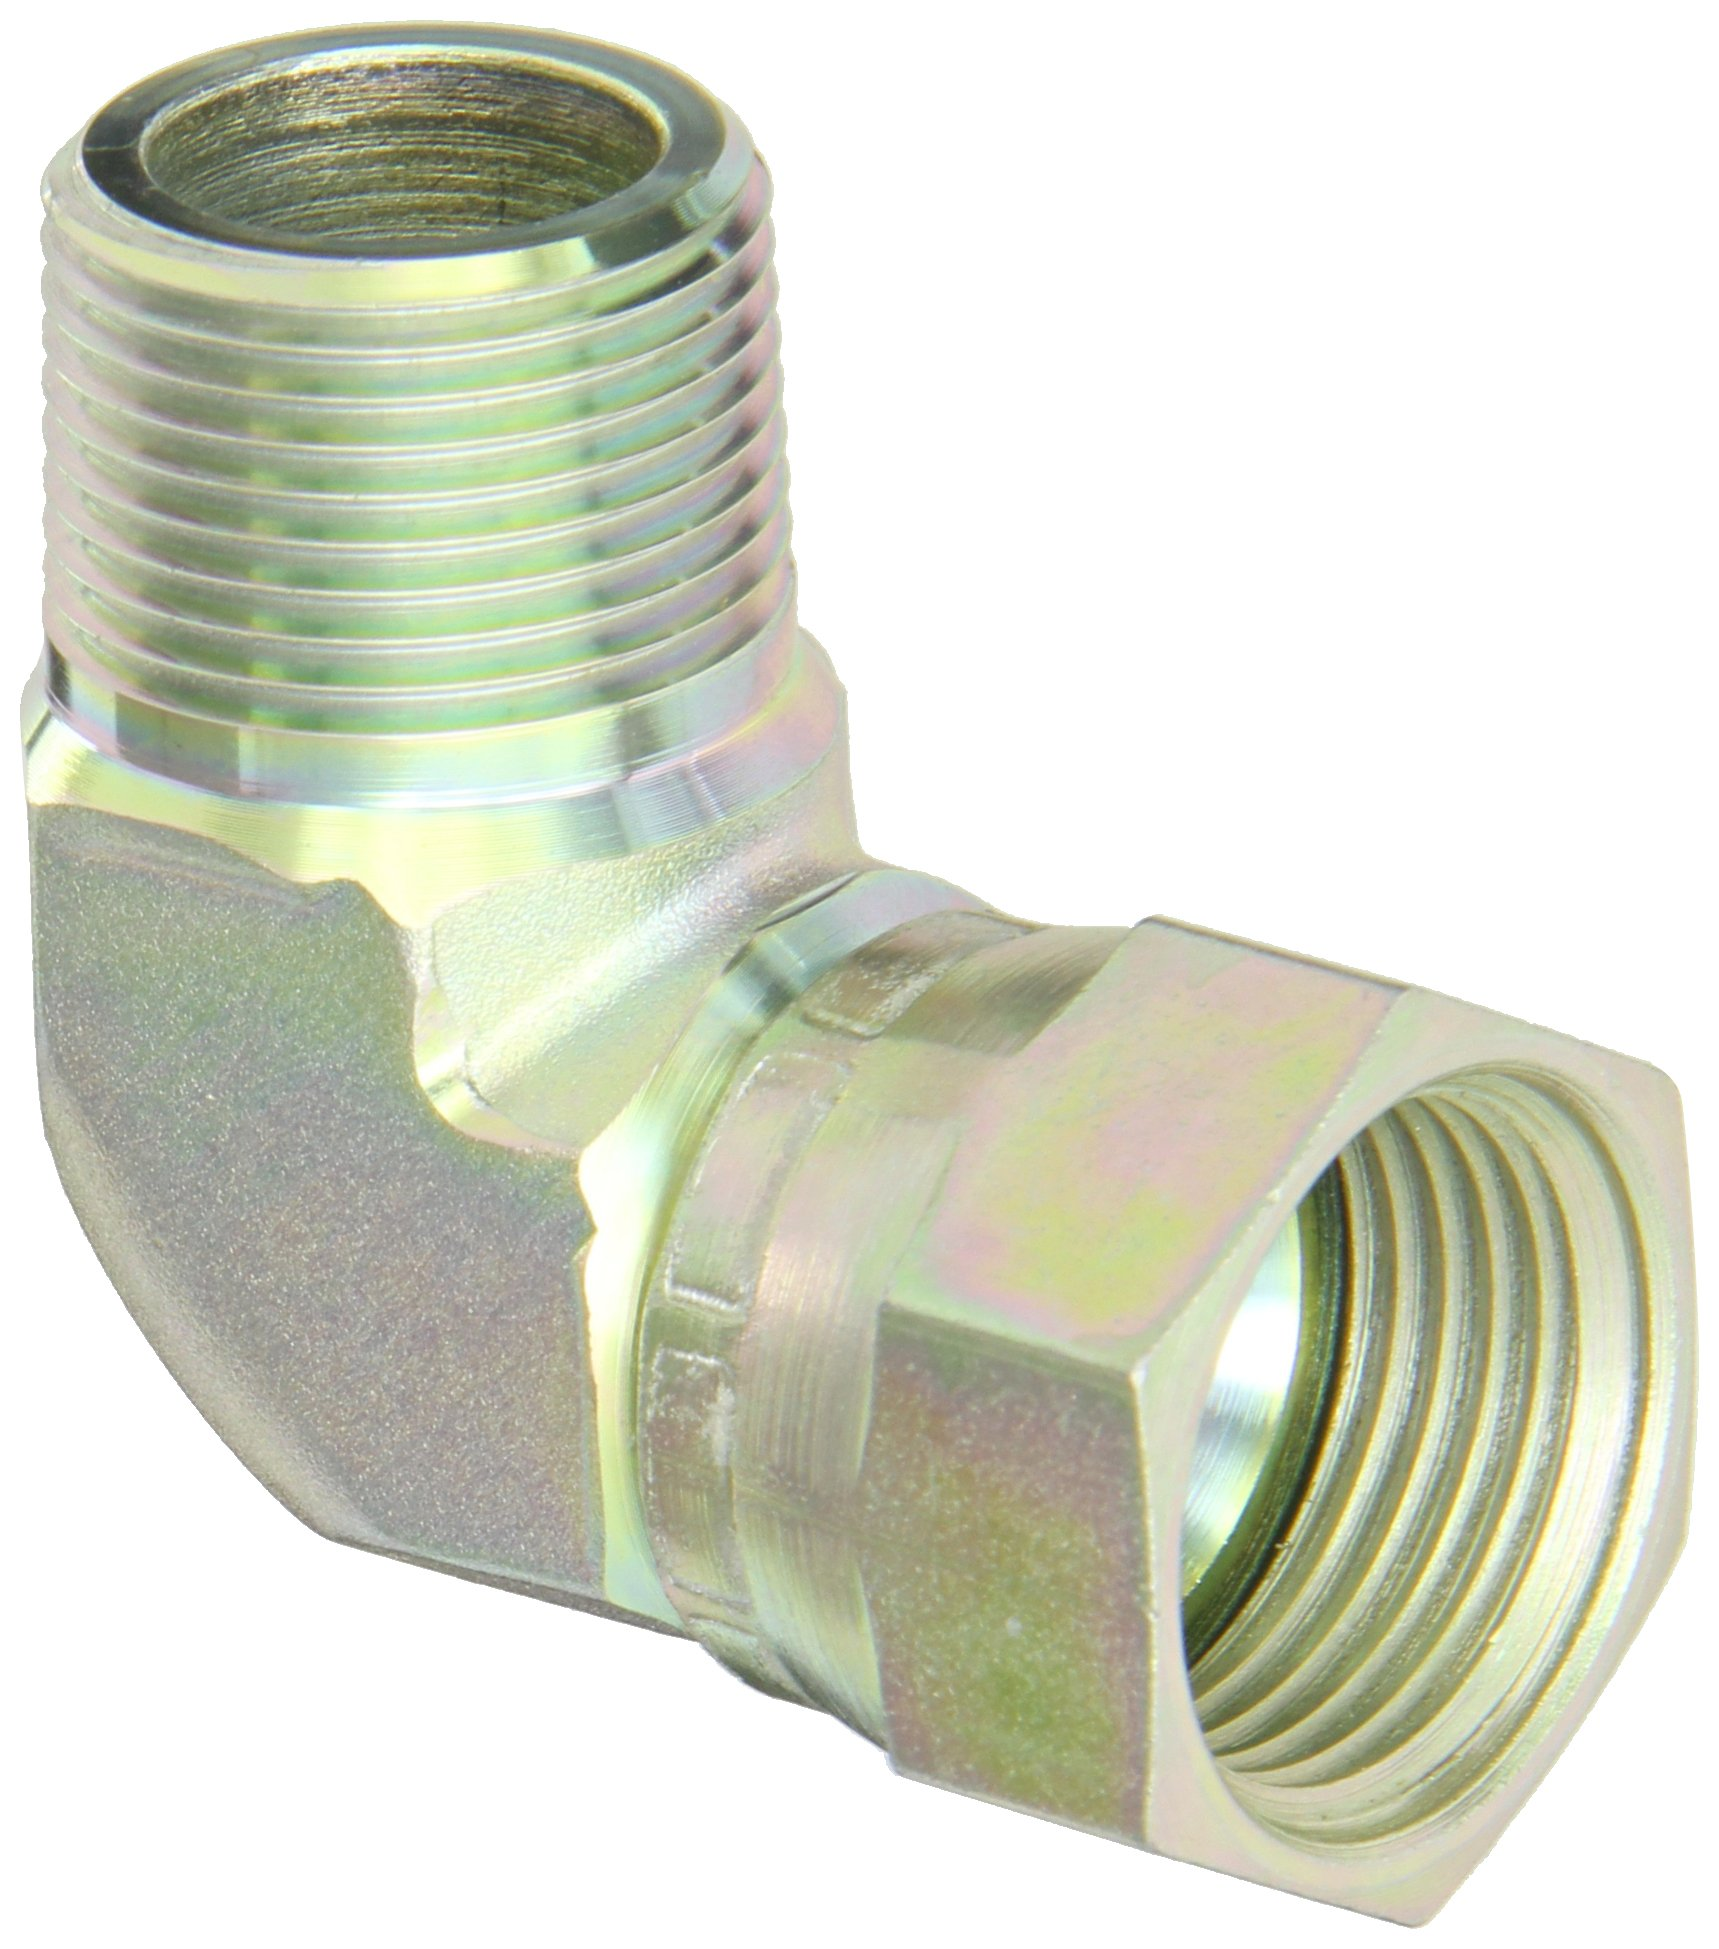 Eaton Aeroquip 2250-12-12S 90 Degree Male Pipe to JIC Swivel, JIC 37 Degree & NPT End Types, Carbon Steel, 3/4 JIC(f) x 3/4 NPT(m) End Size, 3/4'' Tube OD, 3/4'' Male Pipe Size by Aeroquip